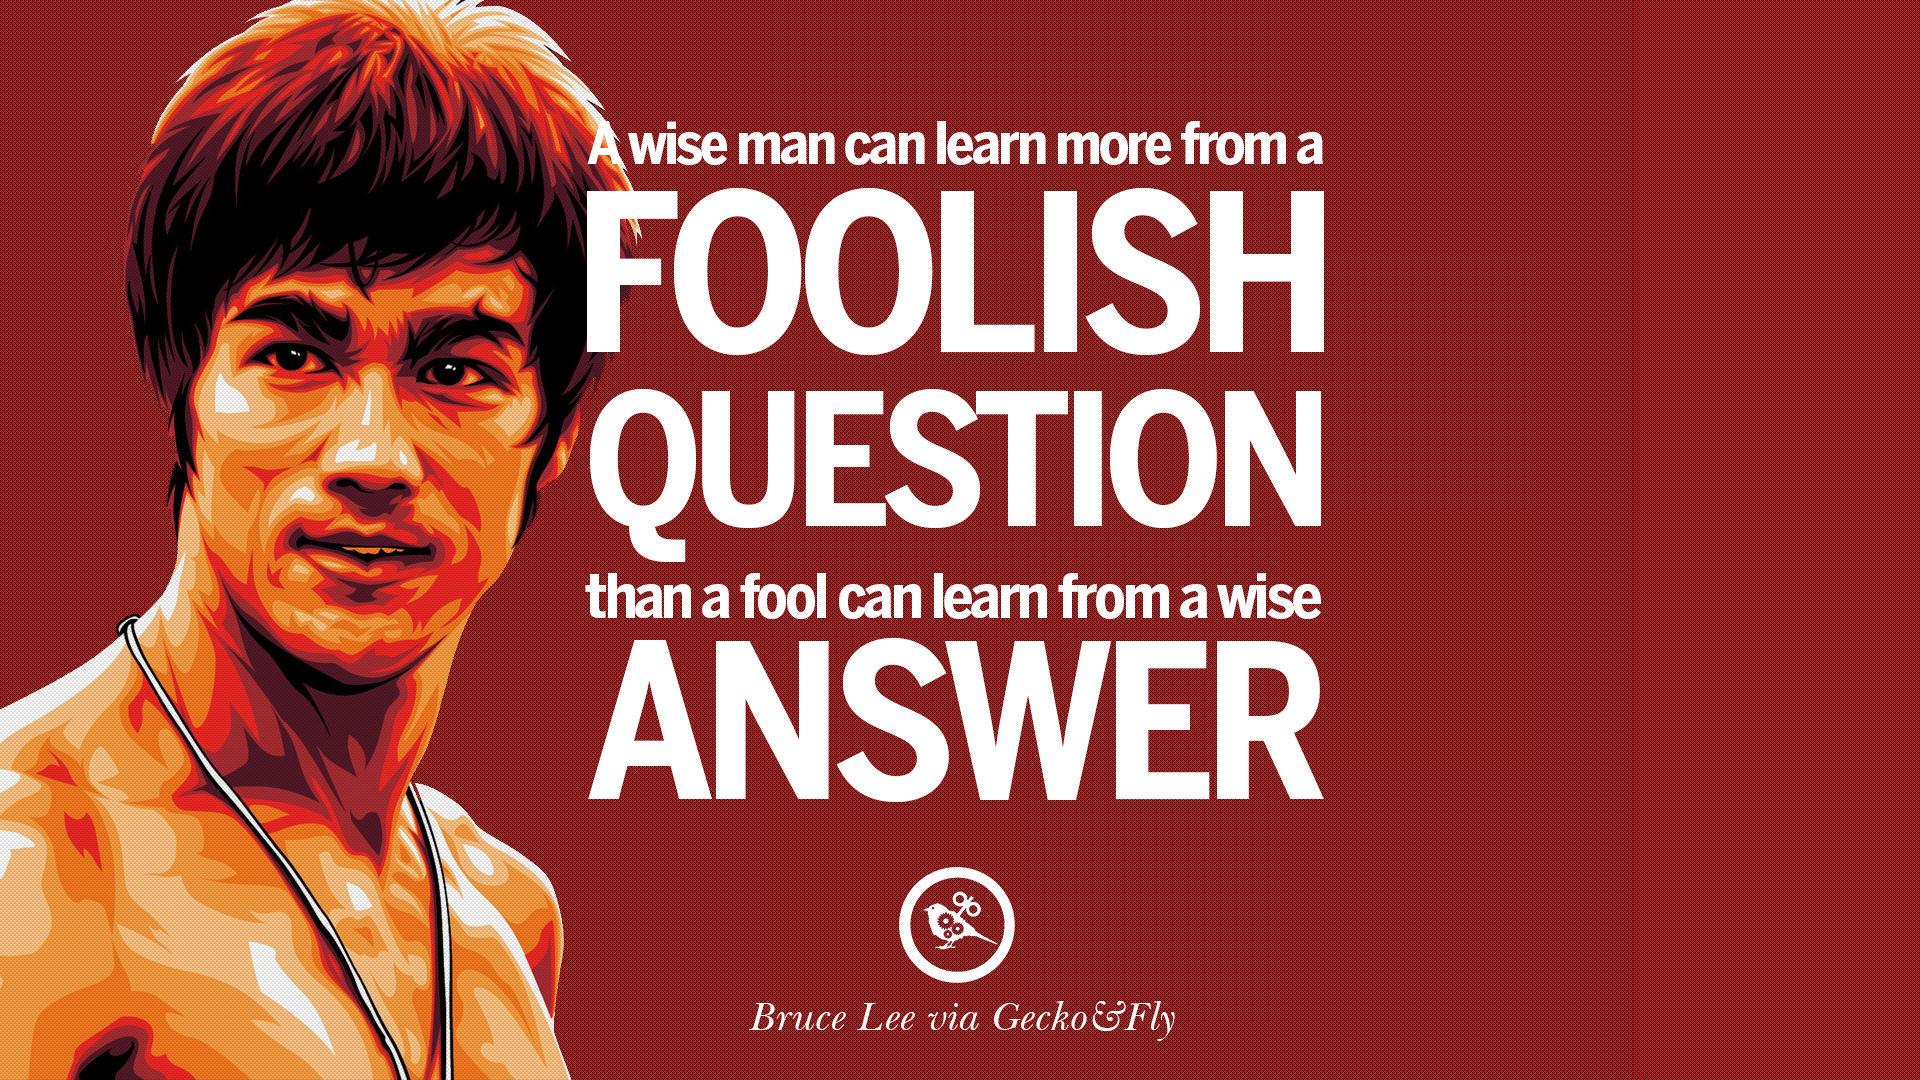 Kurt Cobain Quotes Wallpaper 25 Superb Bruce Lee Quotes